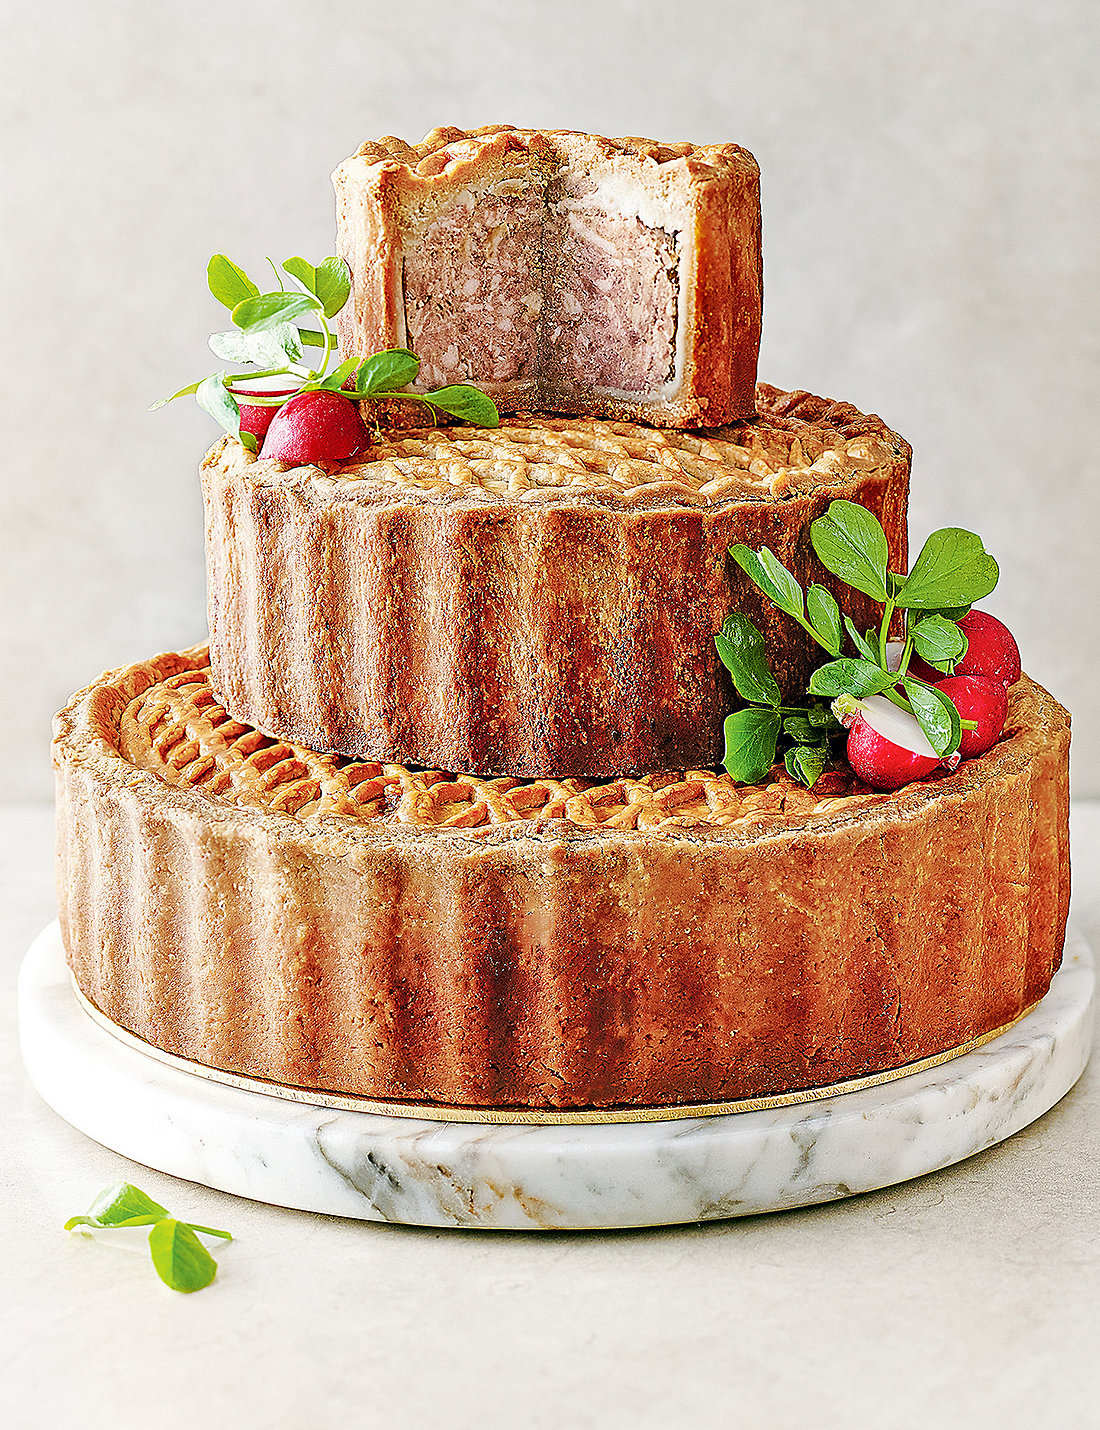 Tiered Celebration Pork Pie